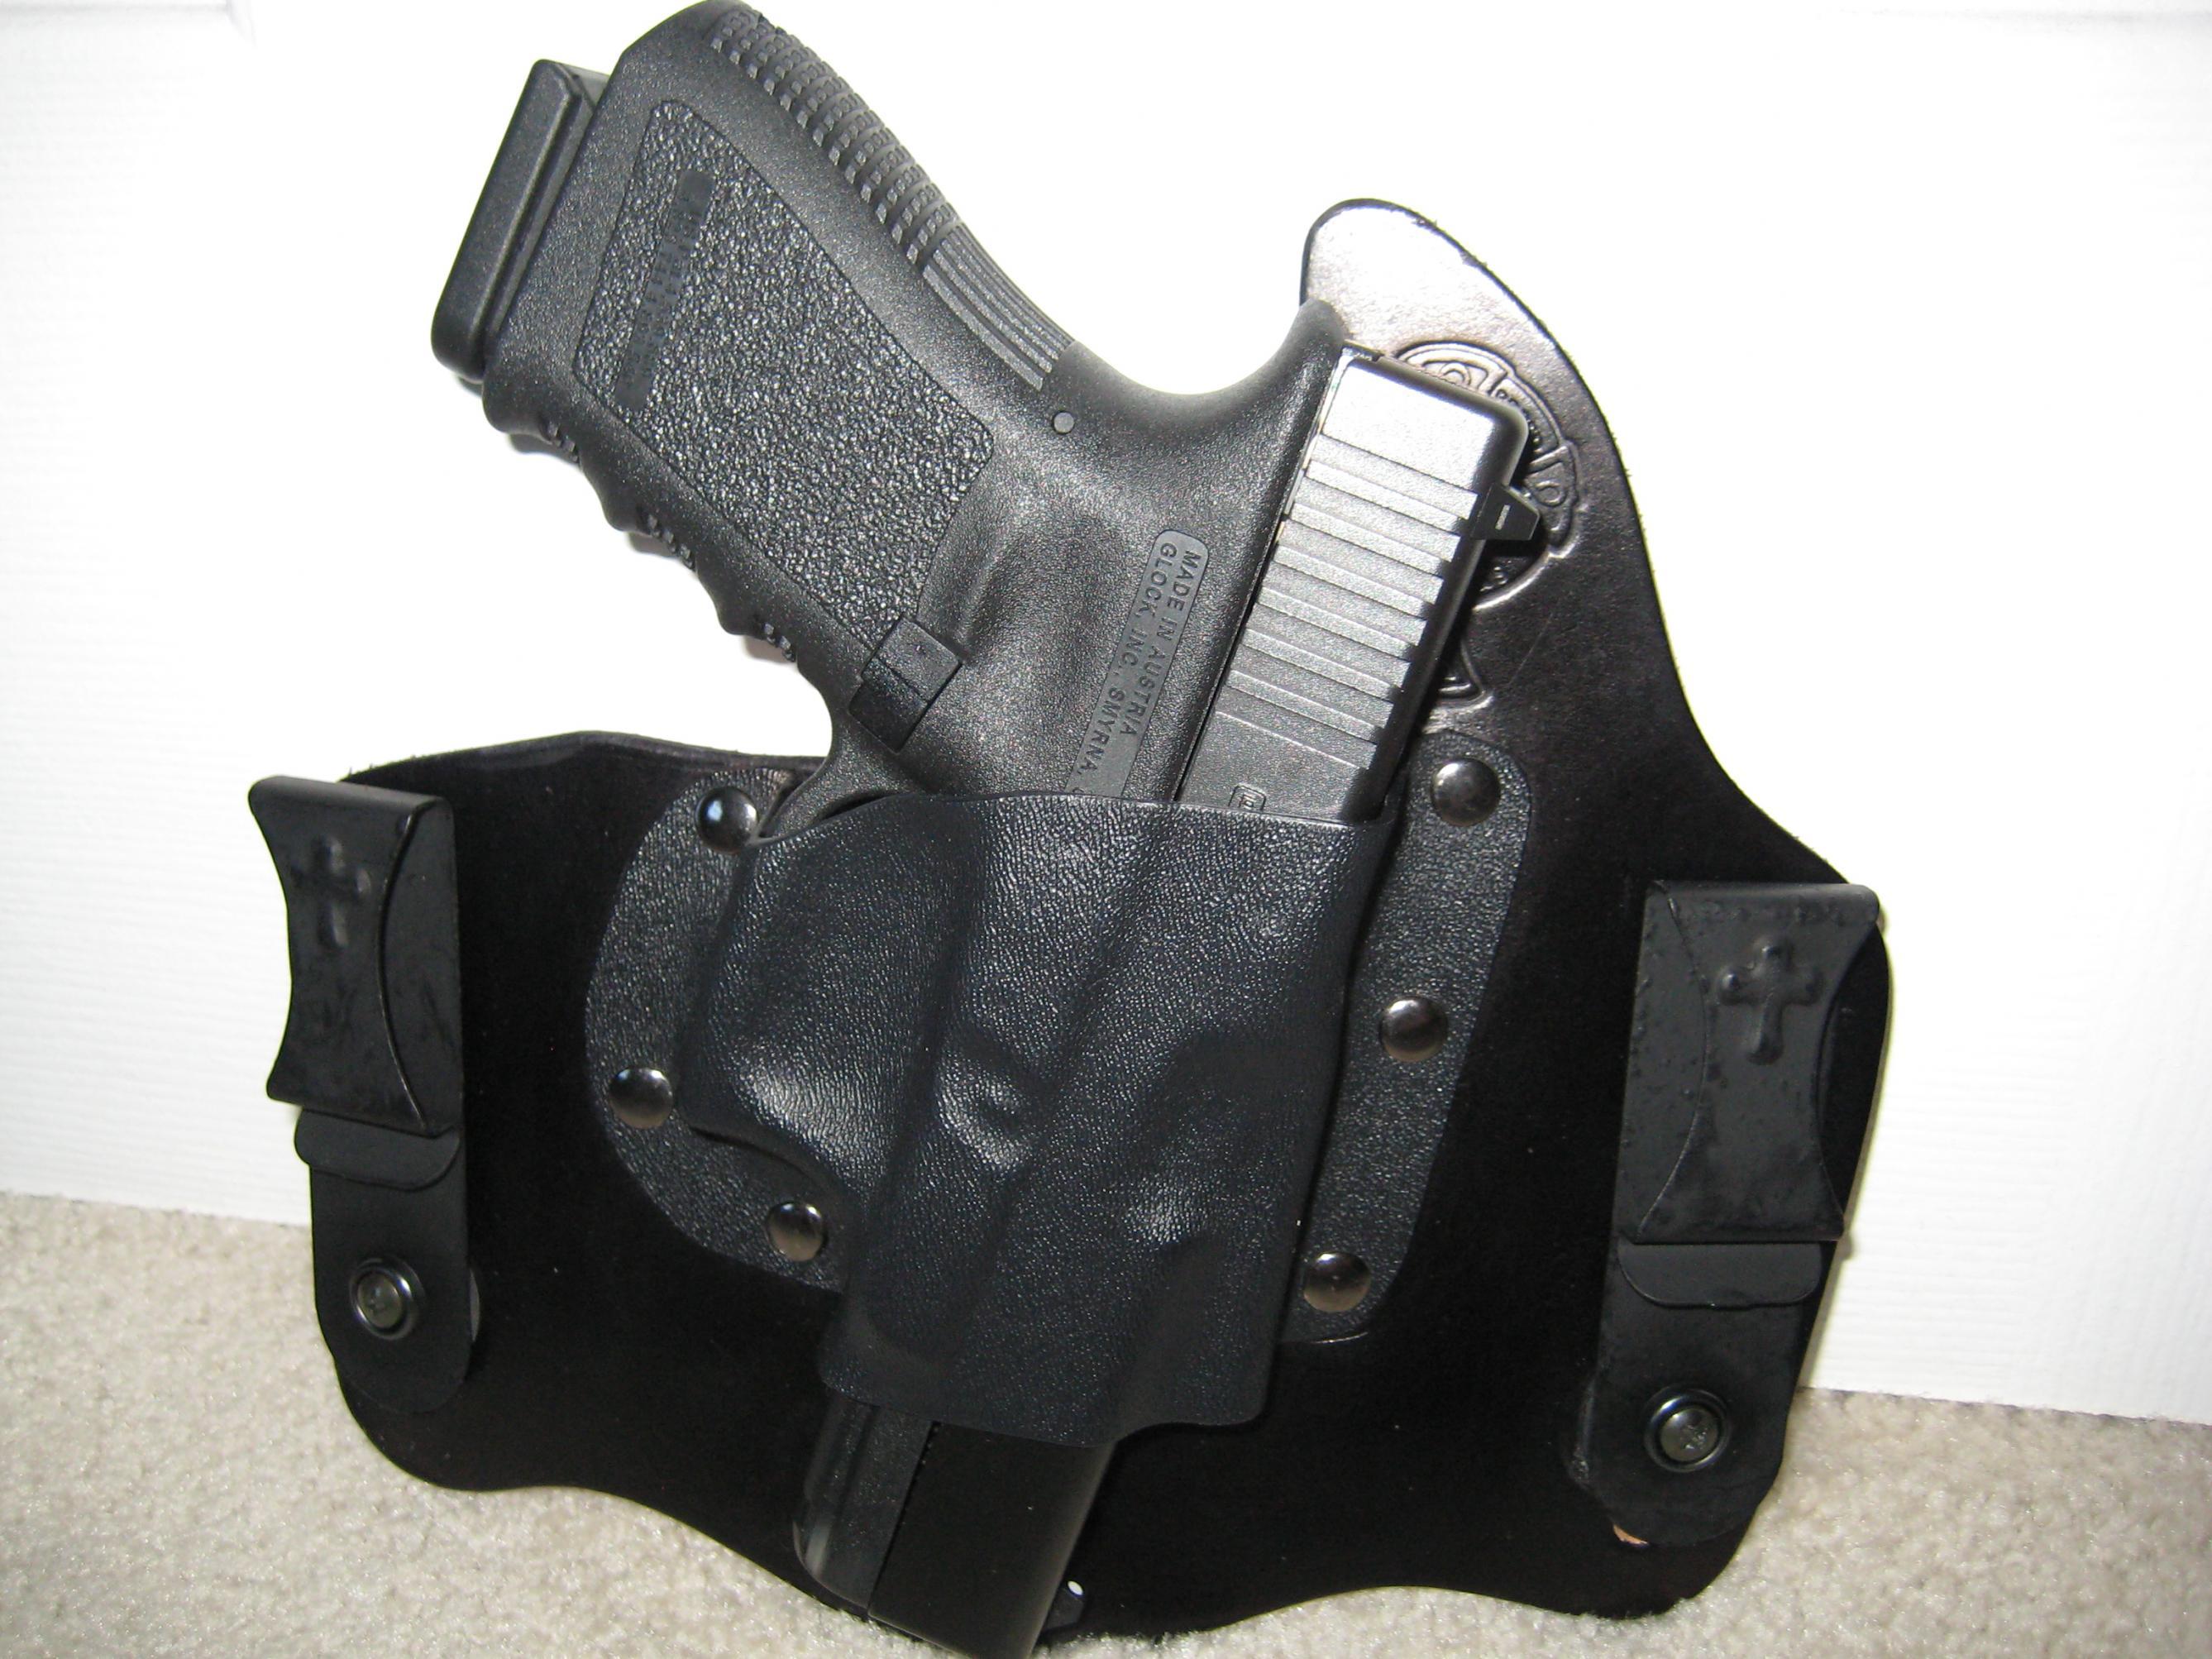 Supertuck pics with guns in.-001.jpg